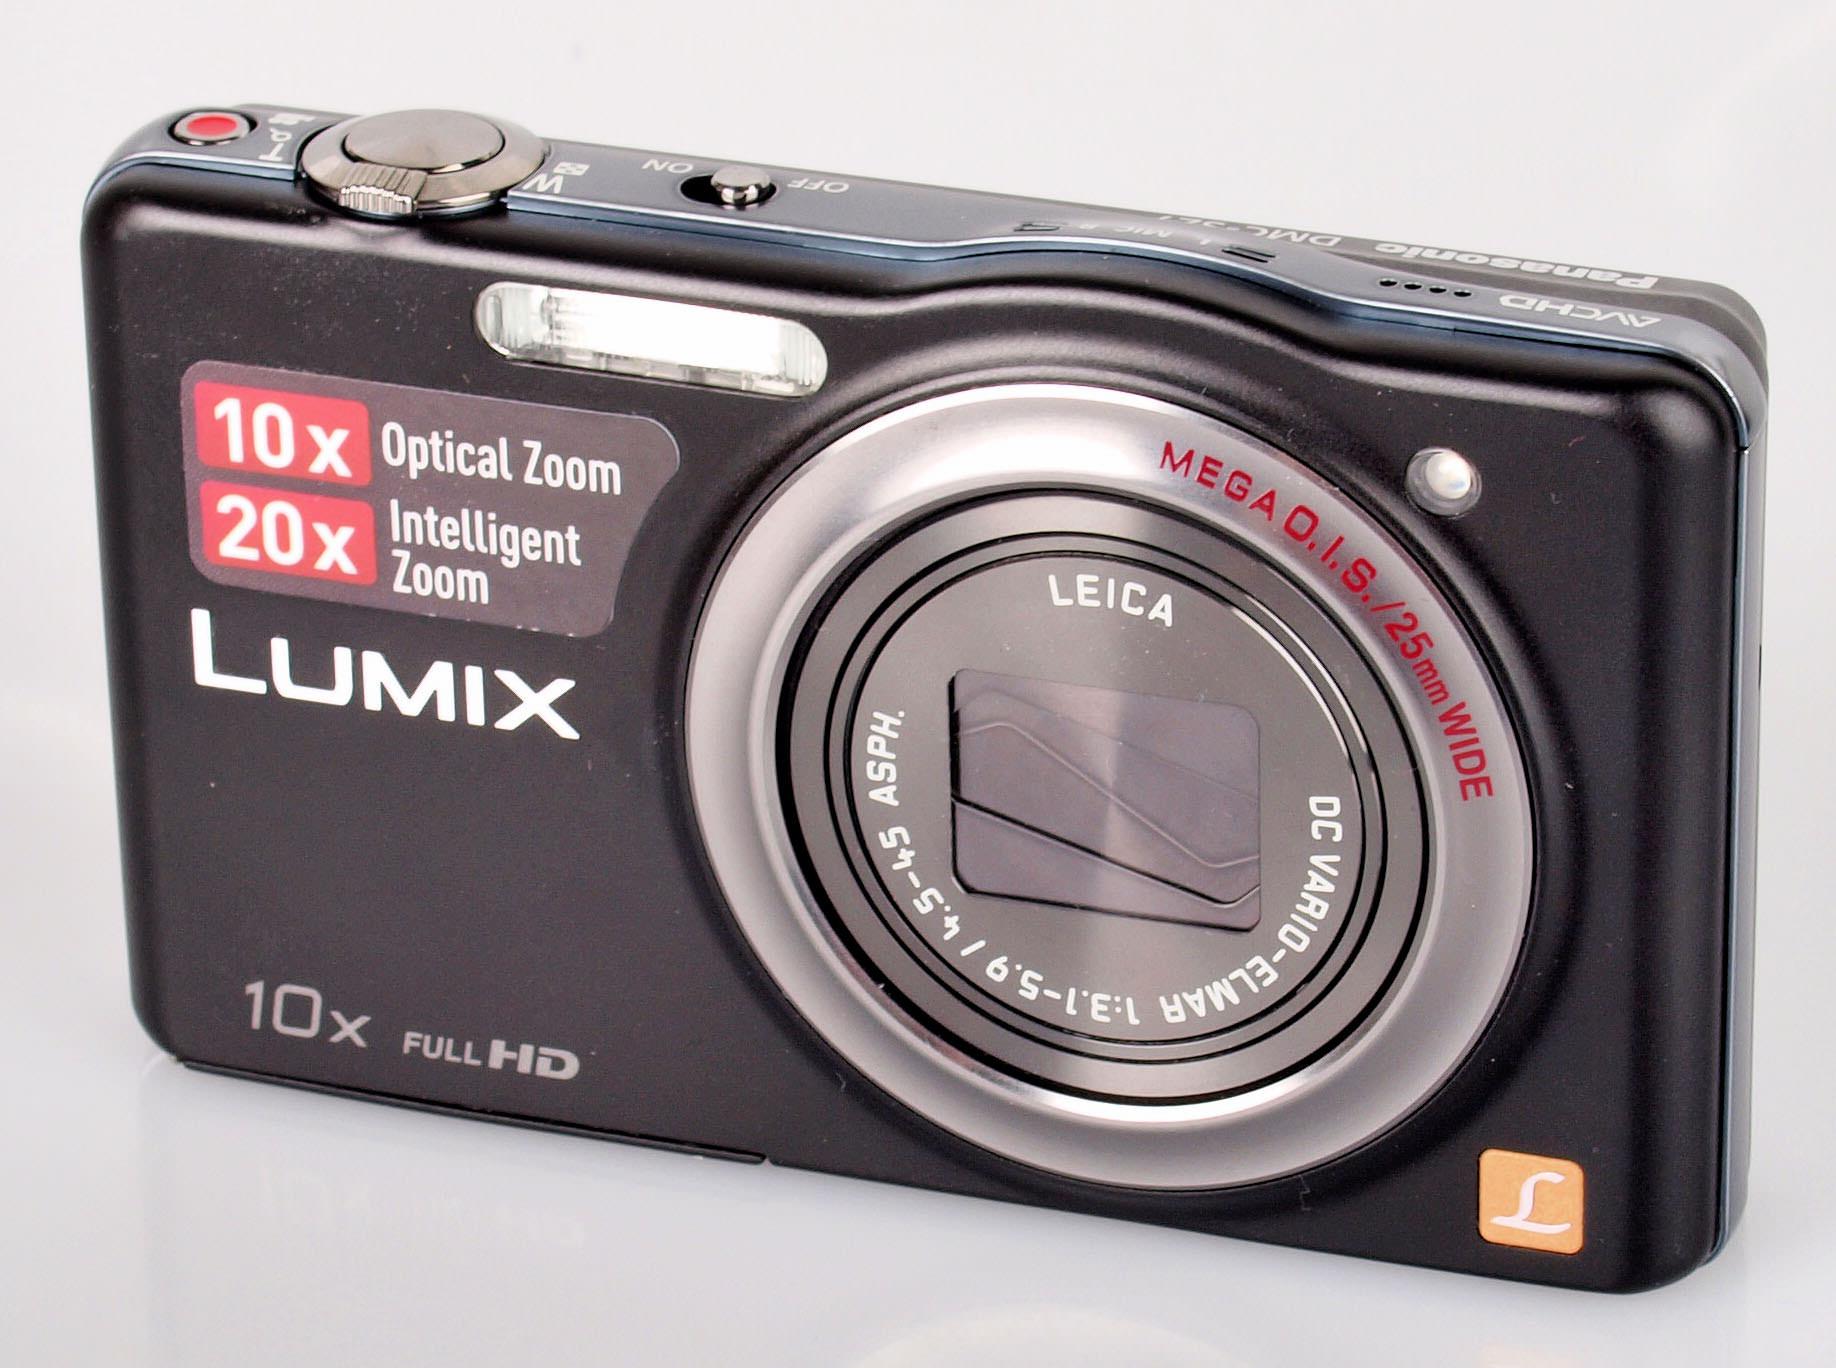 panasonic lumix dmc sz7 digital compact camera review rh ephotozine com  lumix sz7 review